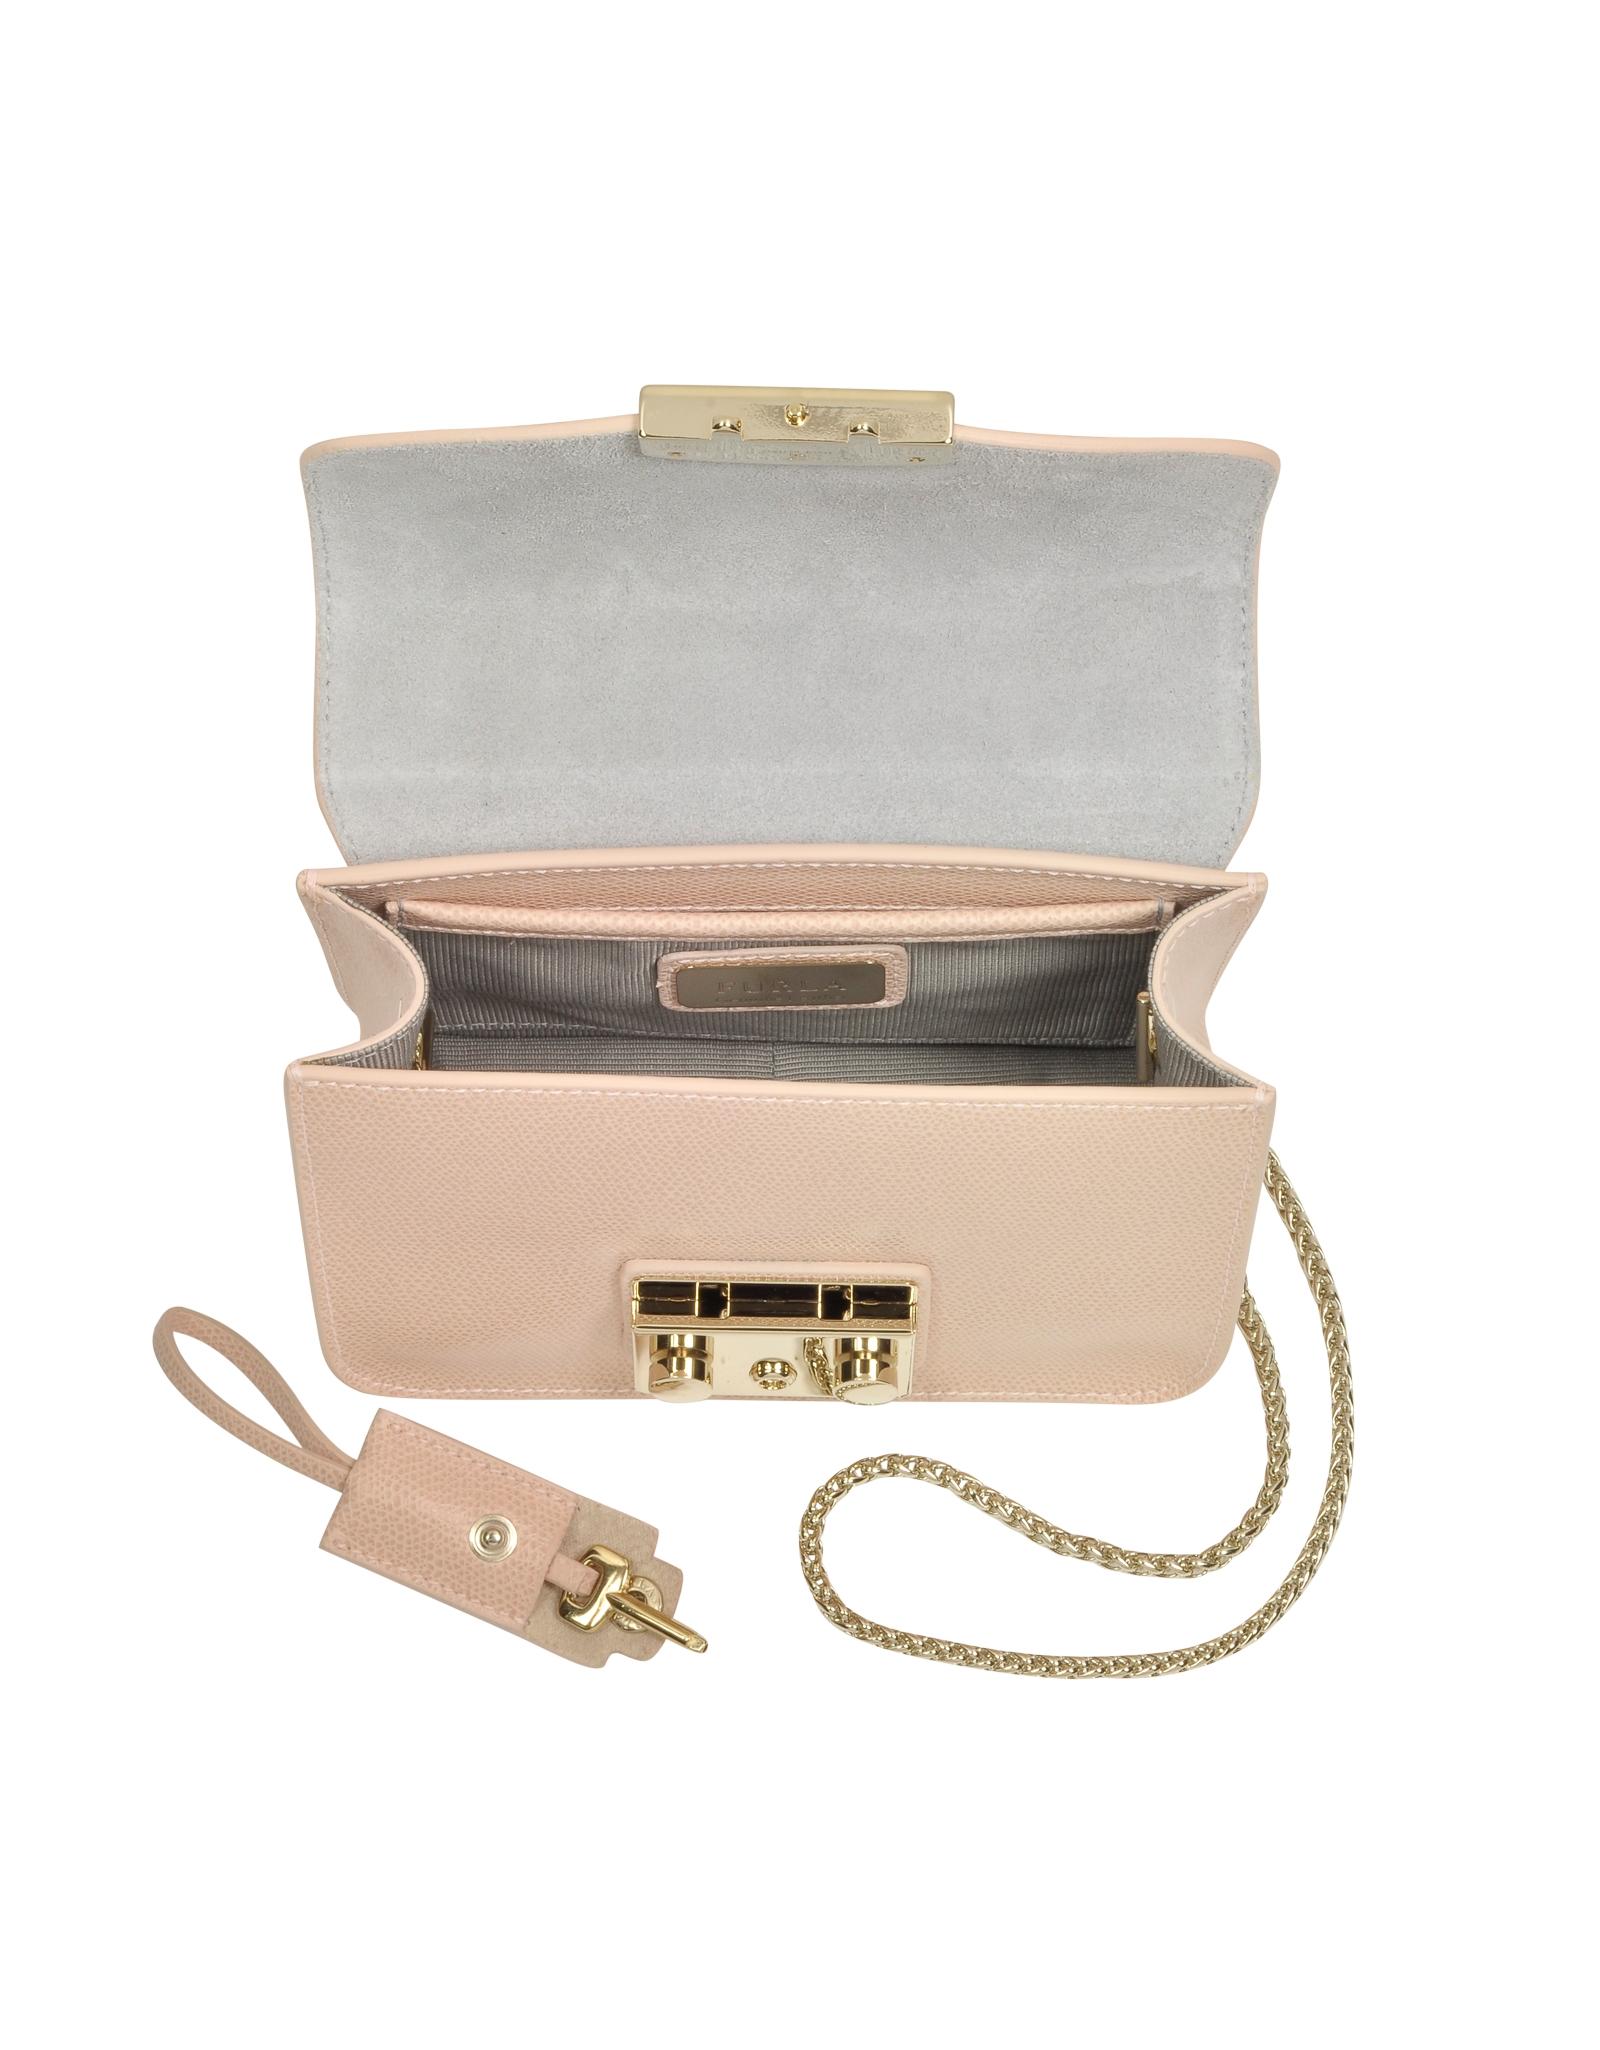 a6f65fc279556 Lyst - Furla Metropolis Magnolia Leather Mini Crossbody Bag in Pink